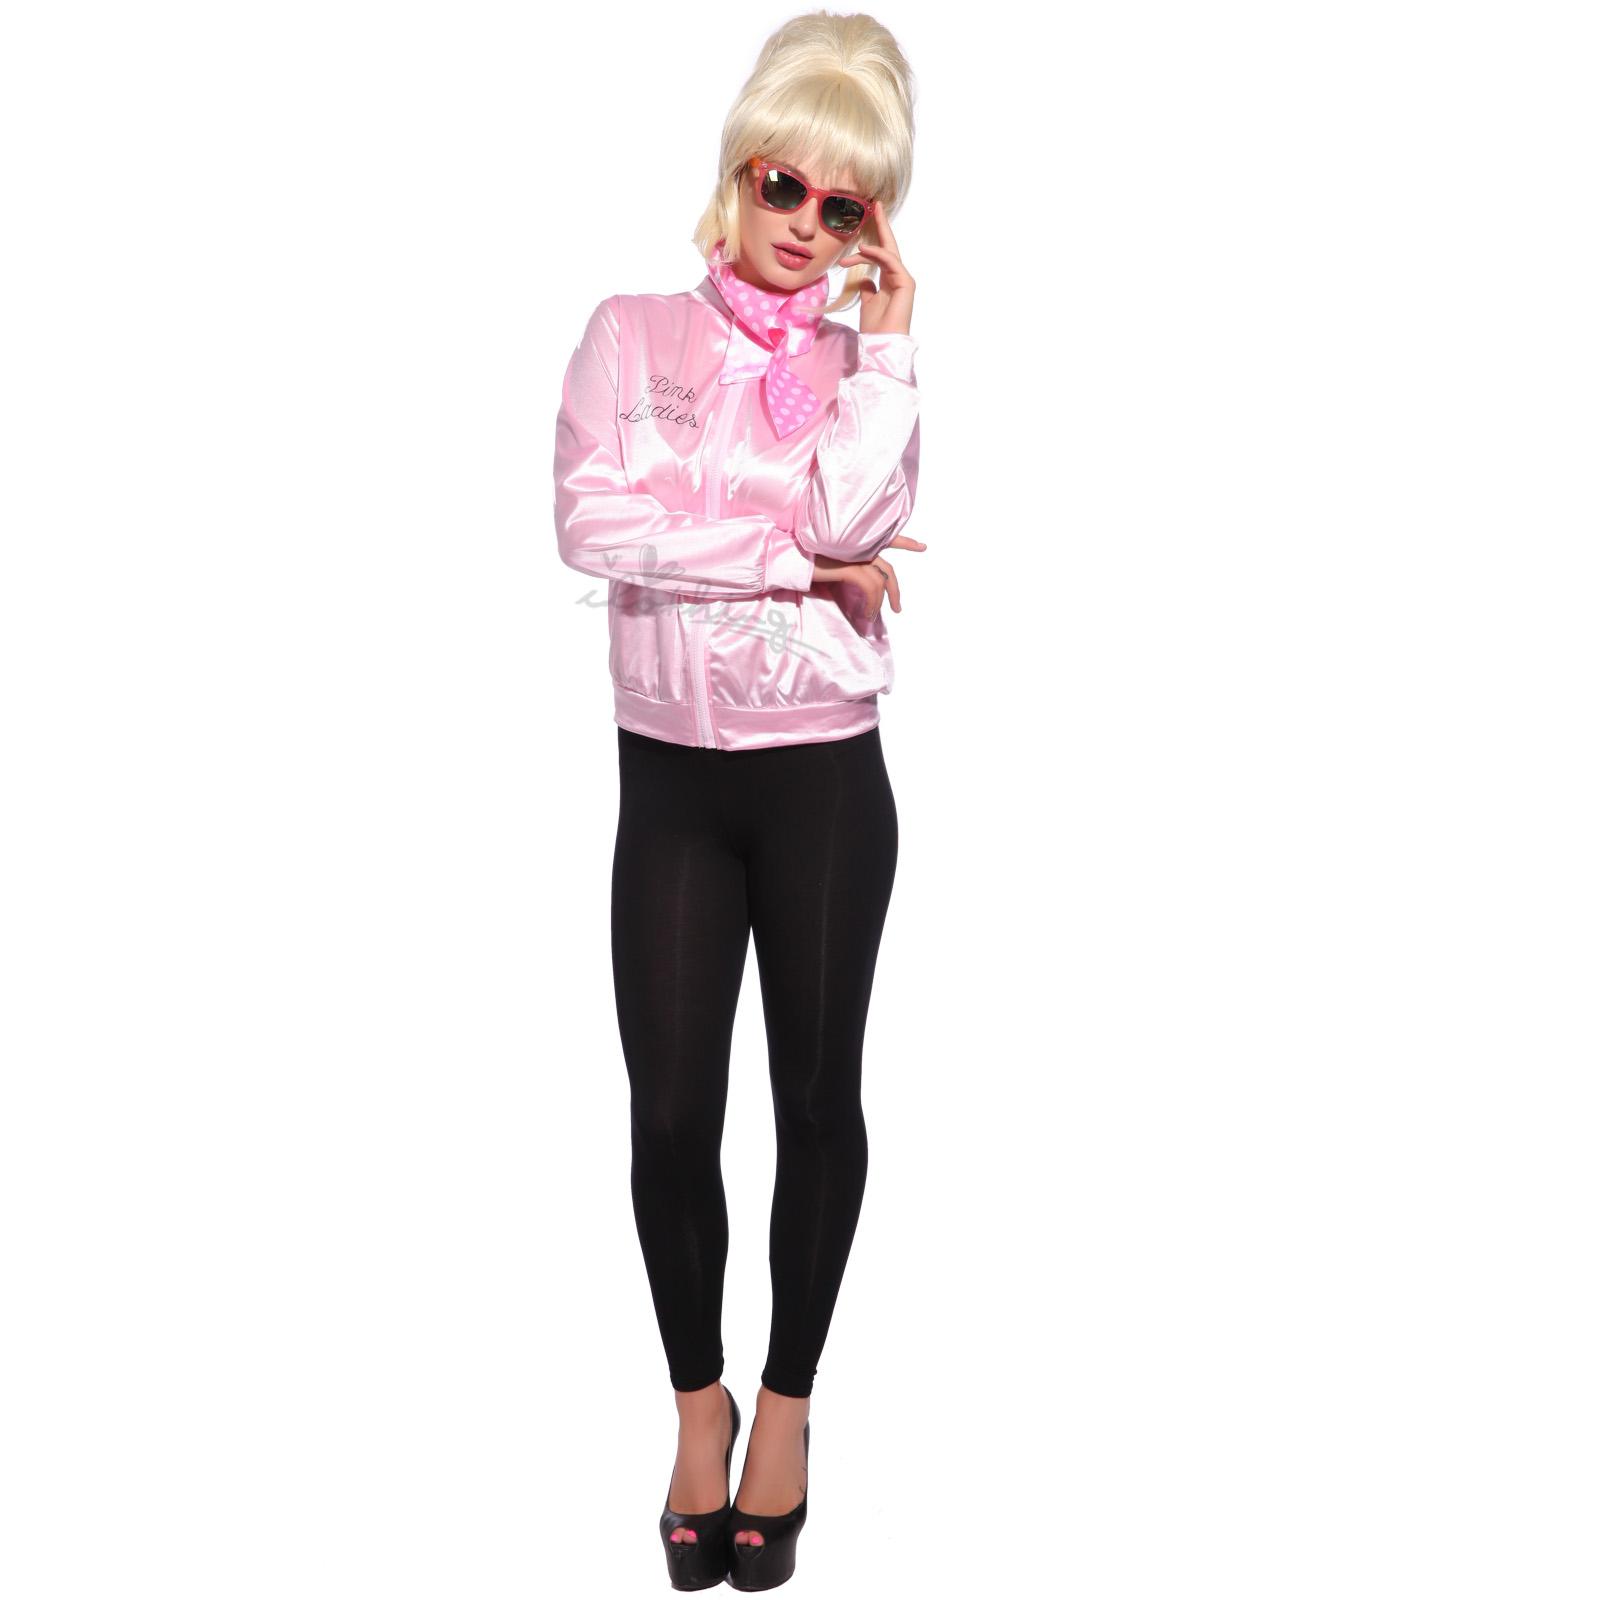 Disfraz de Pink Lady 50s Grease Pink Lady Chaqueta Rosa Talla XS ... eb1059220dc49